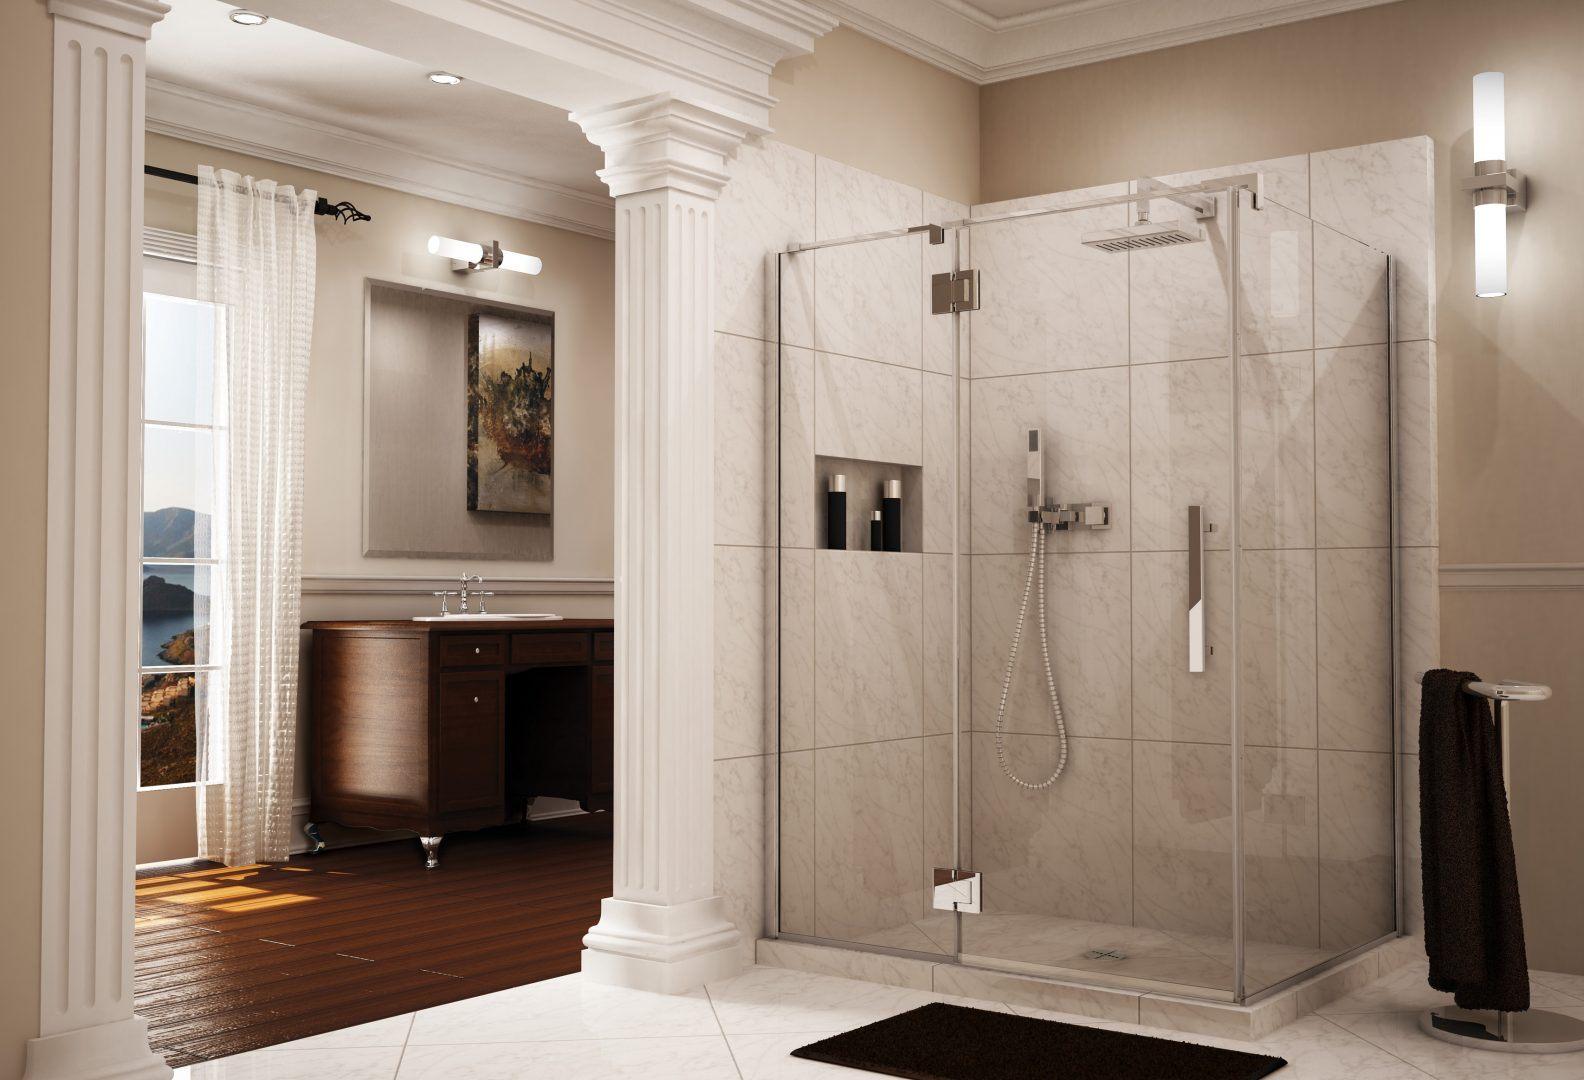 Tipos de divis rias de casa de banho - Ambientador natural para casa ...